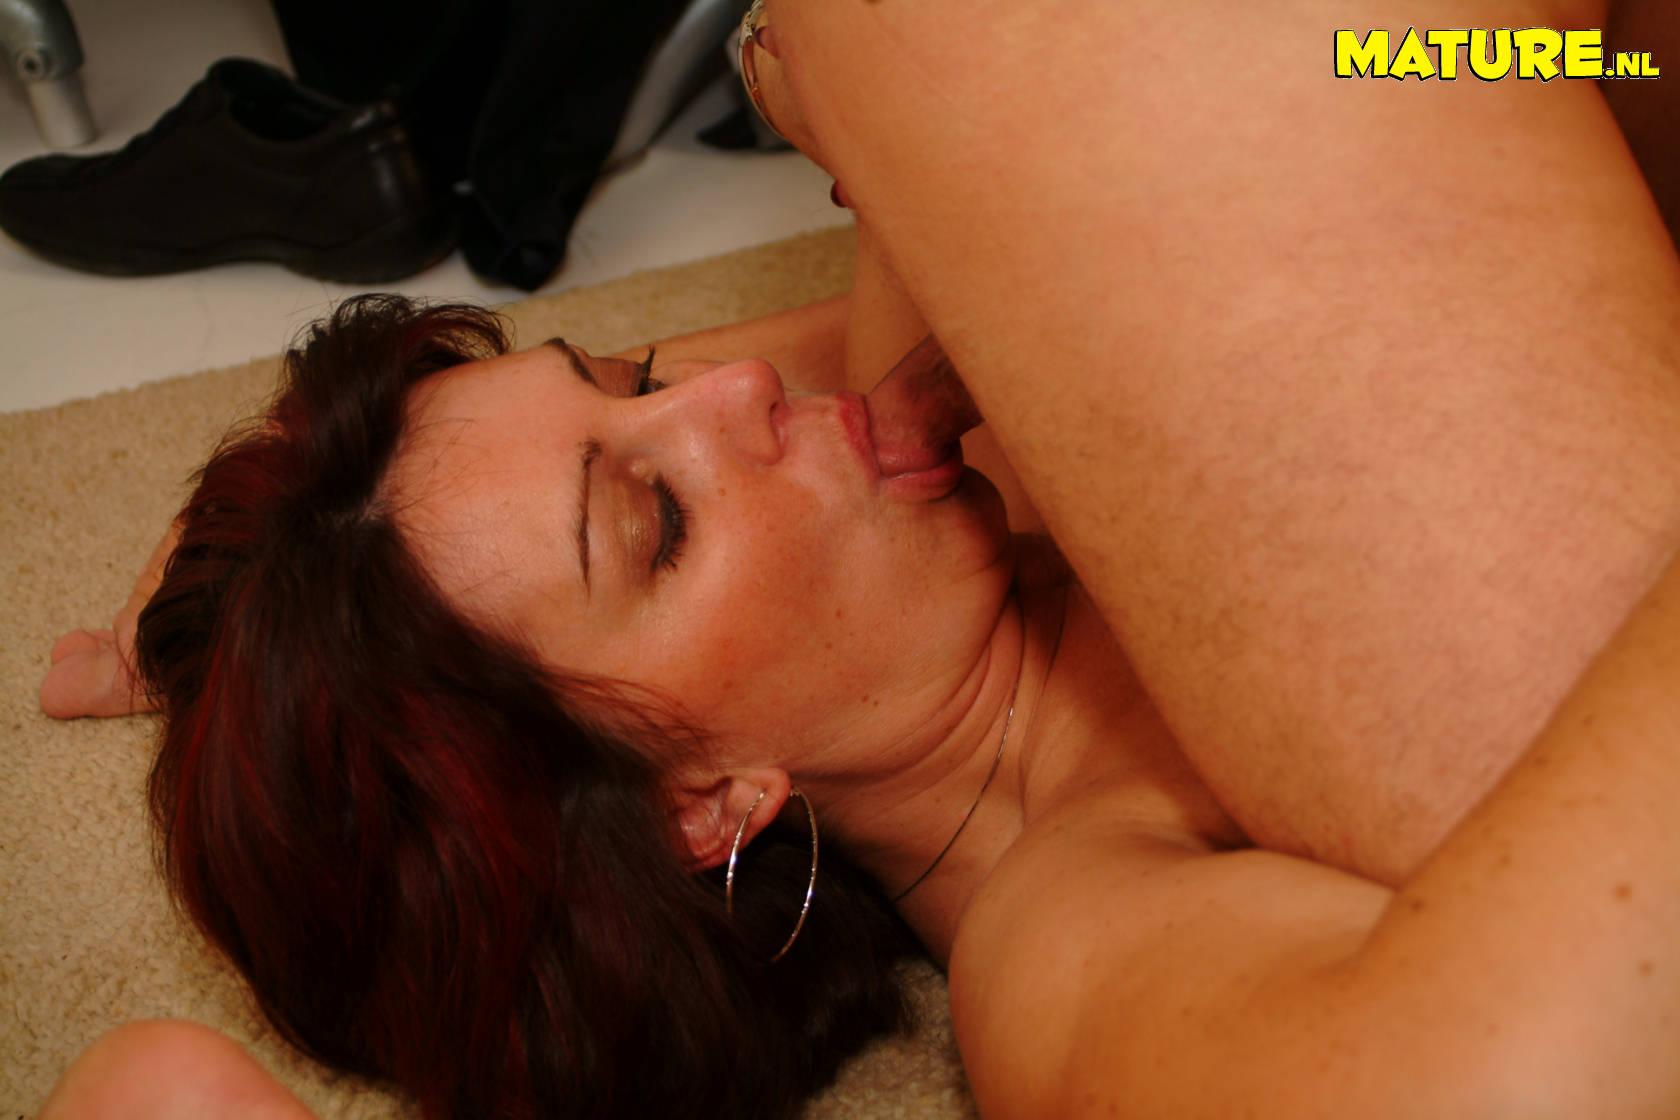 nny mccarthy nude